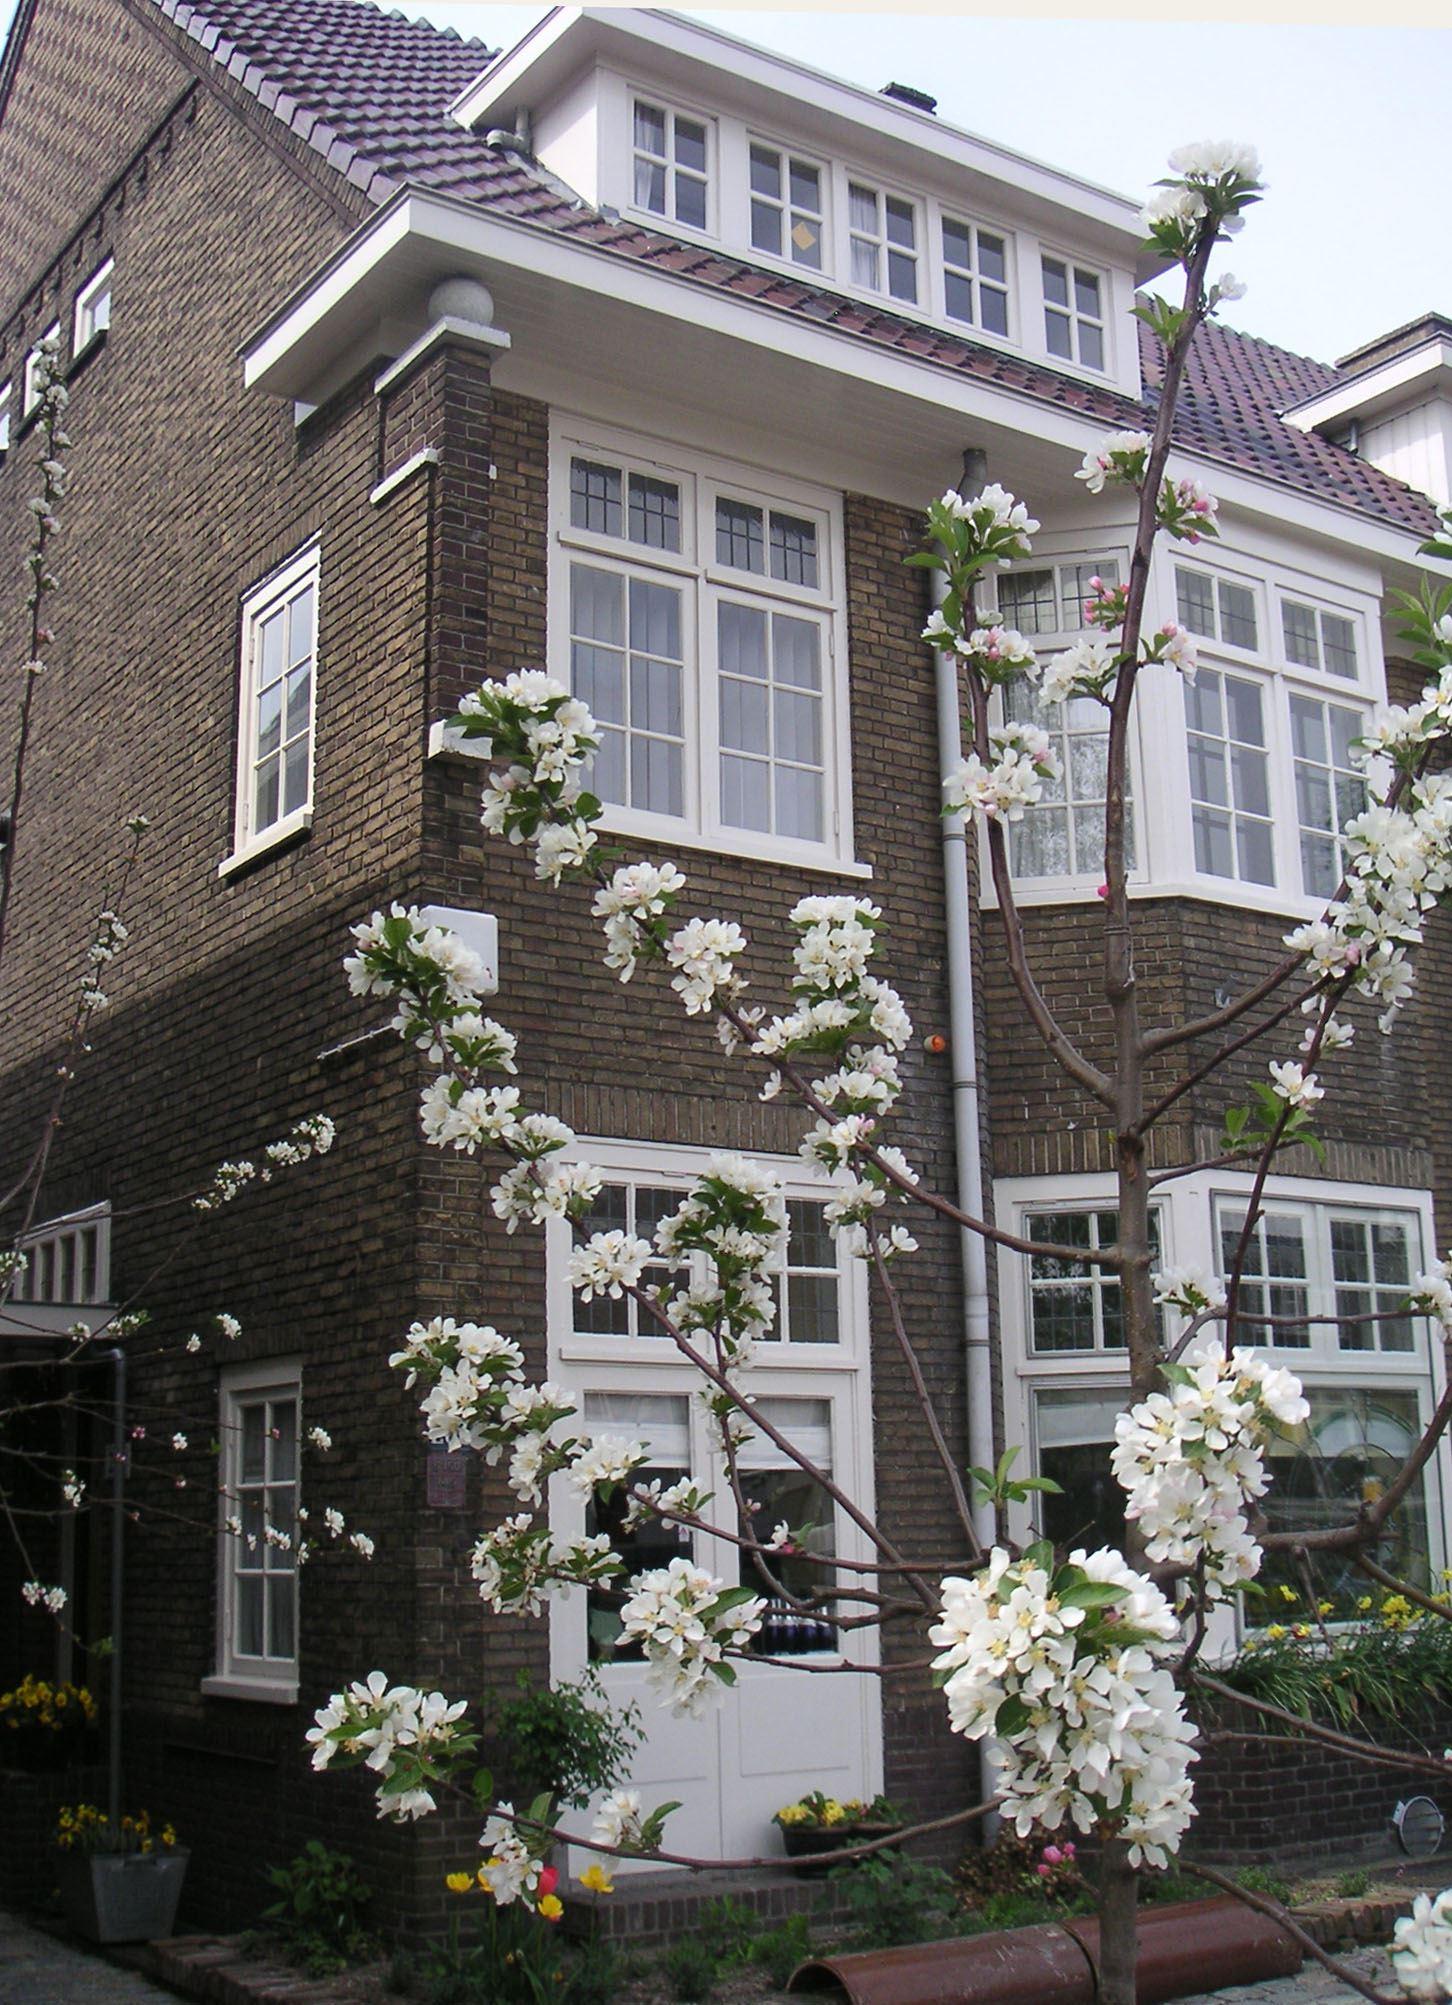 Huis te koop st annastraat 208 6525 gx nijmegen funda for Woning te koop nijmegen